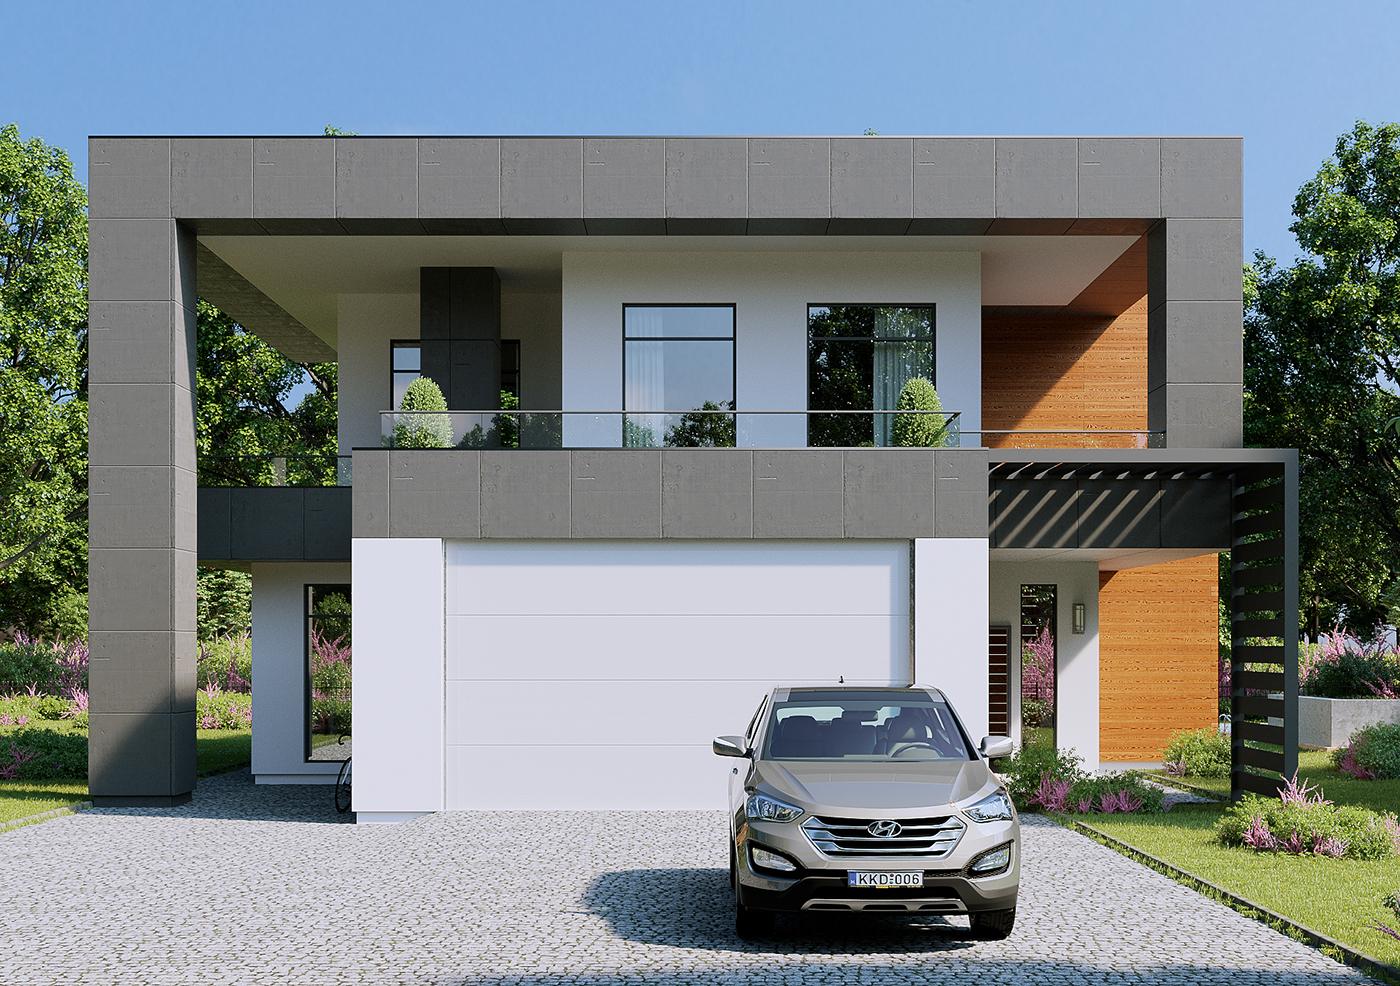 exterior 3dsmax corona-renderer design Ireland visualisations